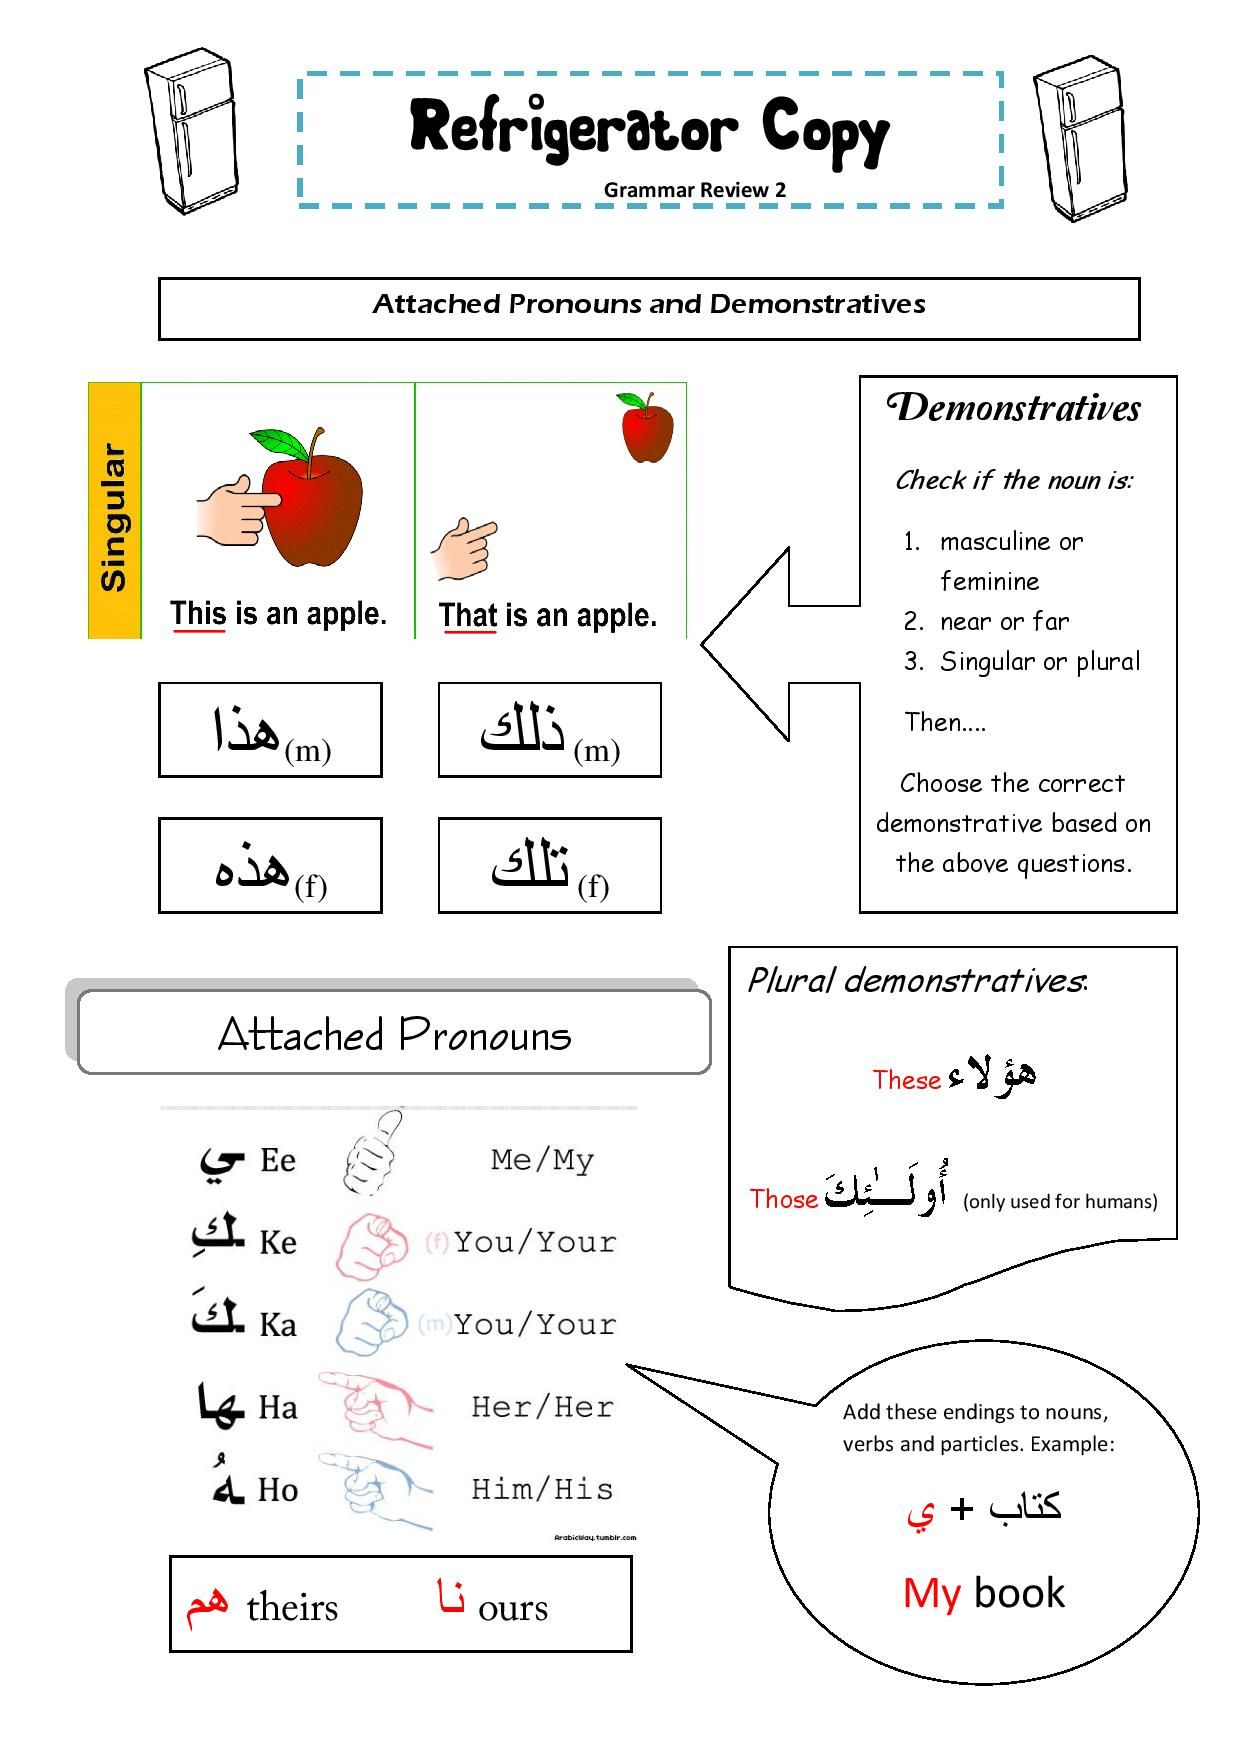 small resolution of https://dubaikhalifas.com/arabic-demonstrative-pronoun-worksheet-free-printable-at-www-arabicadventures-pronoun/